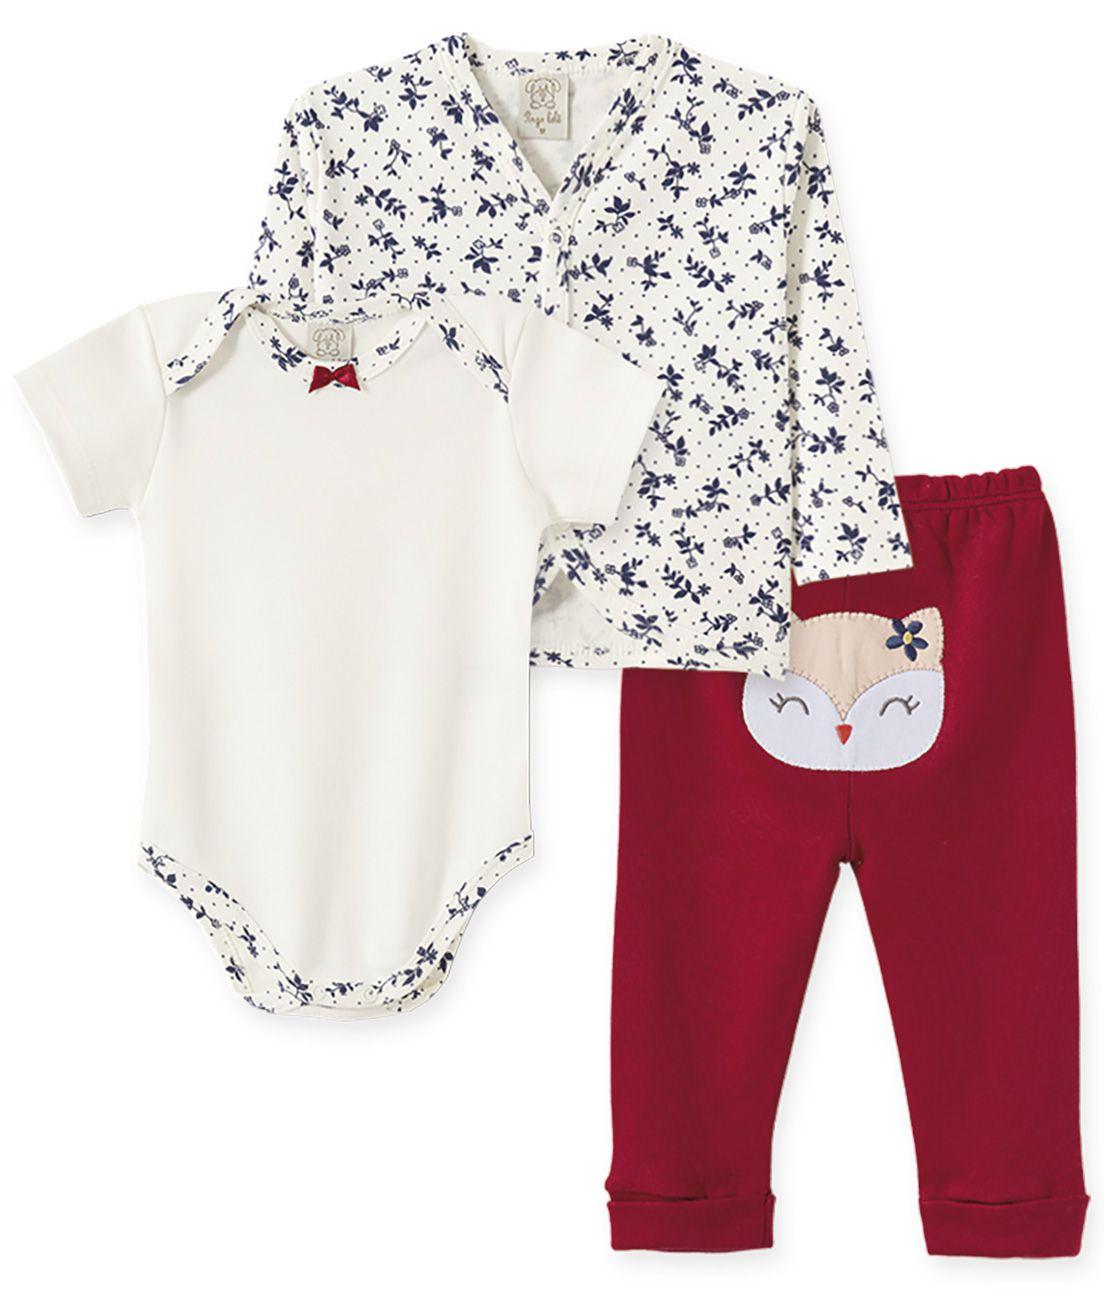 Conjunto bebê Body manga curta, Calça e Casaco Pingo Lelê Coruja Floral